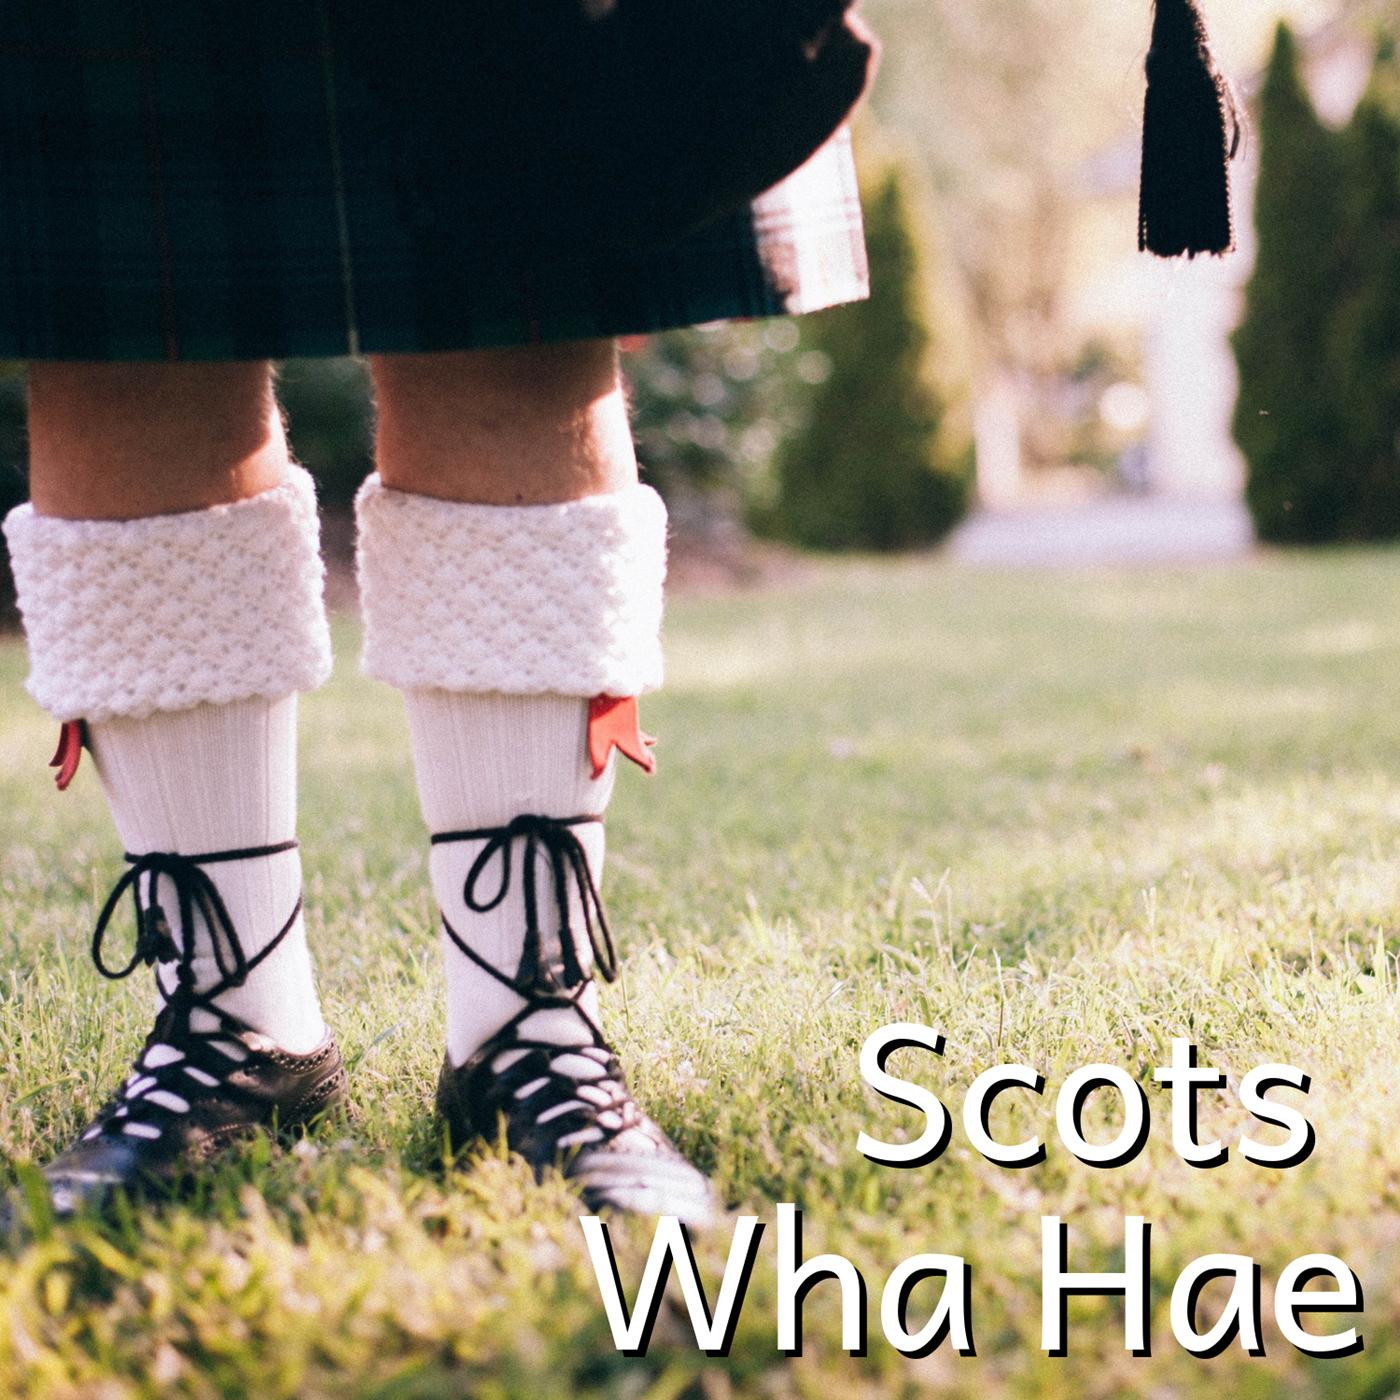 Scots Wha Hae - 09-08-2020 - Contemporary Scottish music